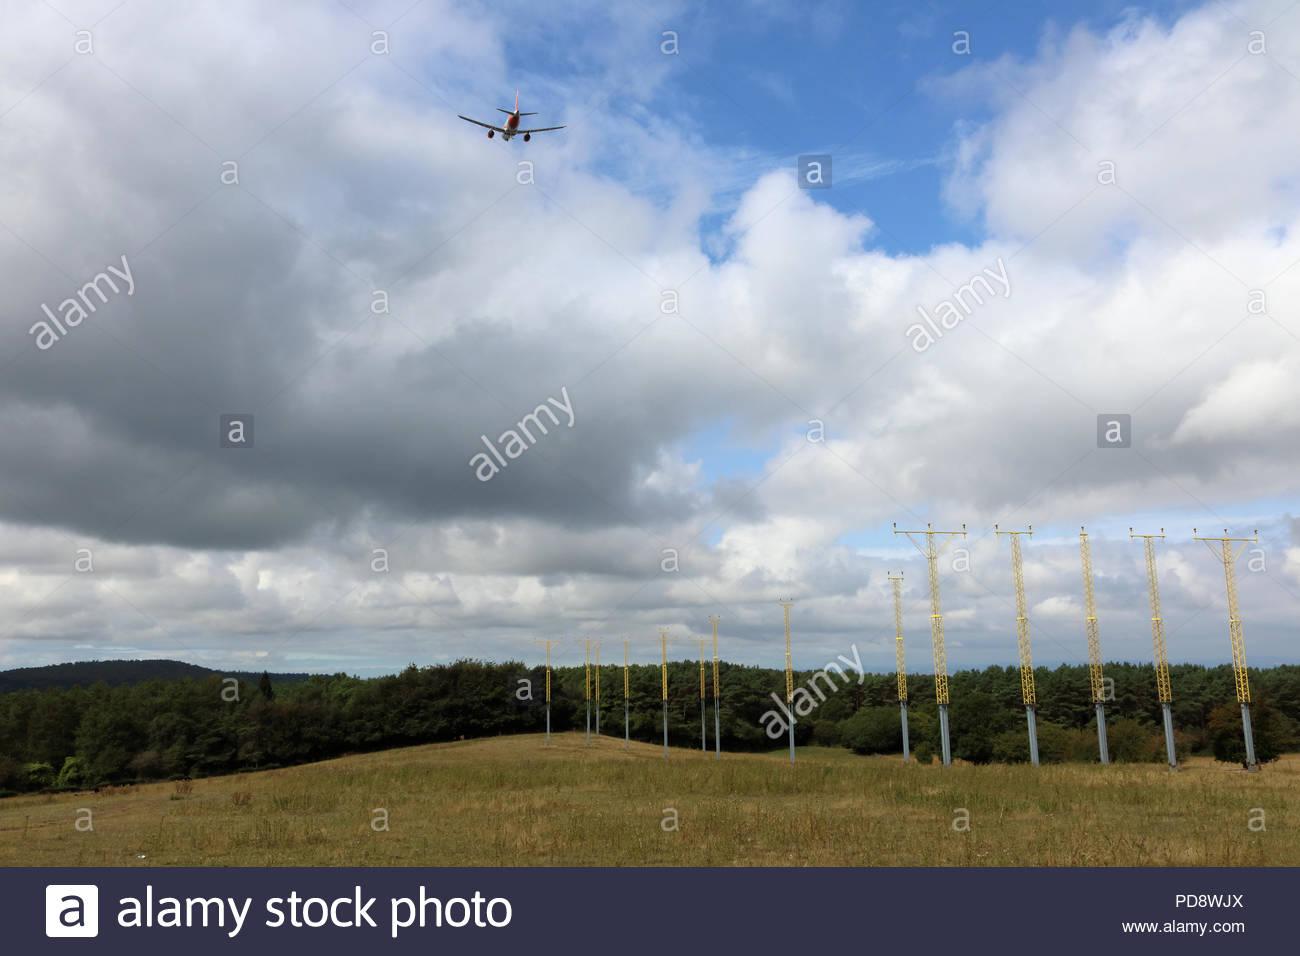 Landing equipment at the end of the Runway, Bristol Airport, Bristol, UK - Stock Image